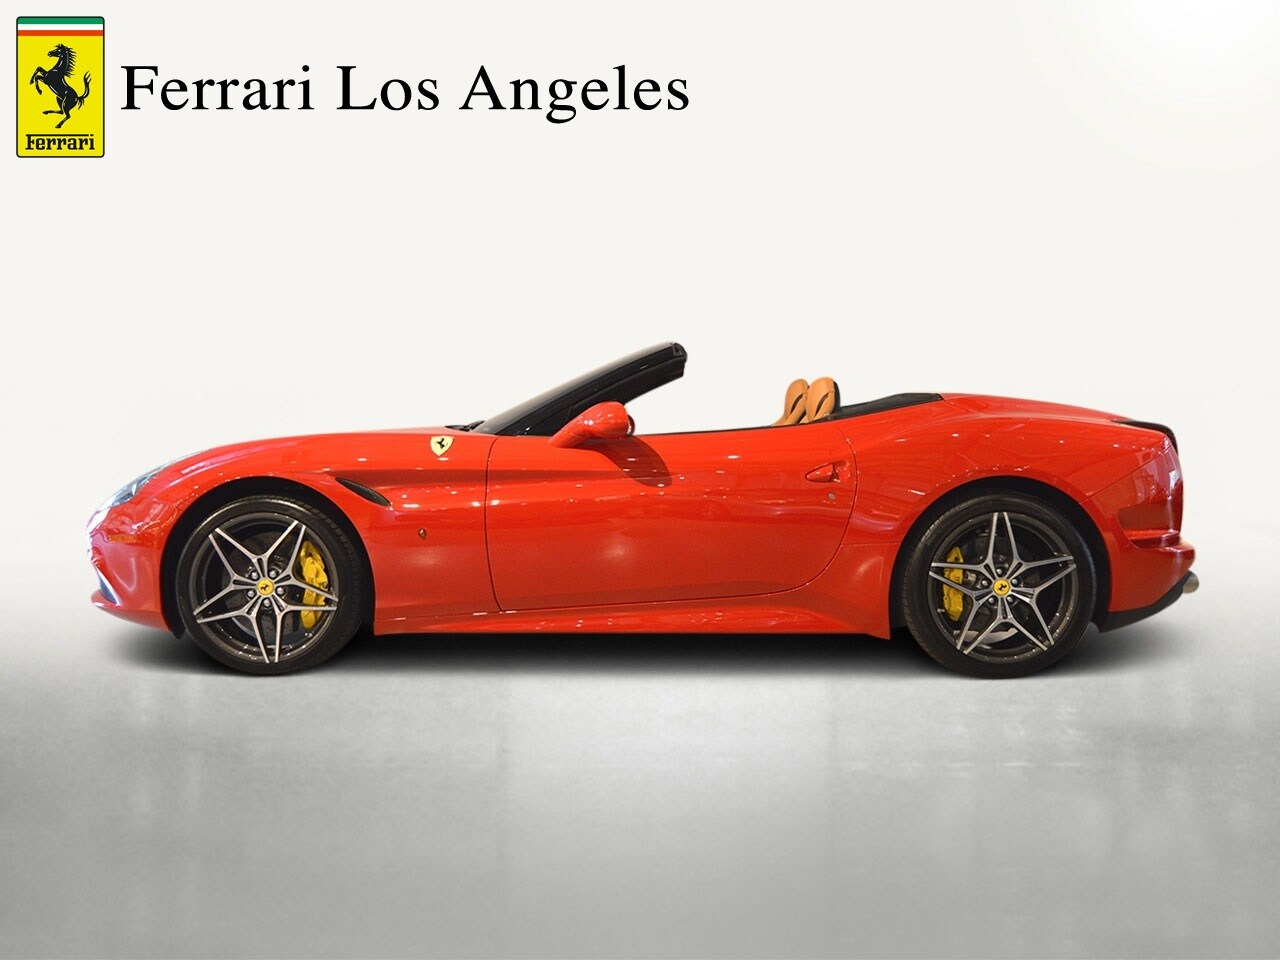 Certified PreOwned 2015 Ferrari California T For Sale Van Nuys, CA  Ferrari Los Angeles  VIN